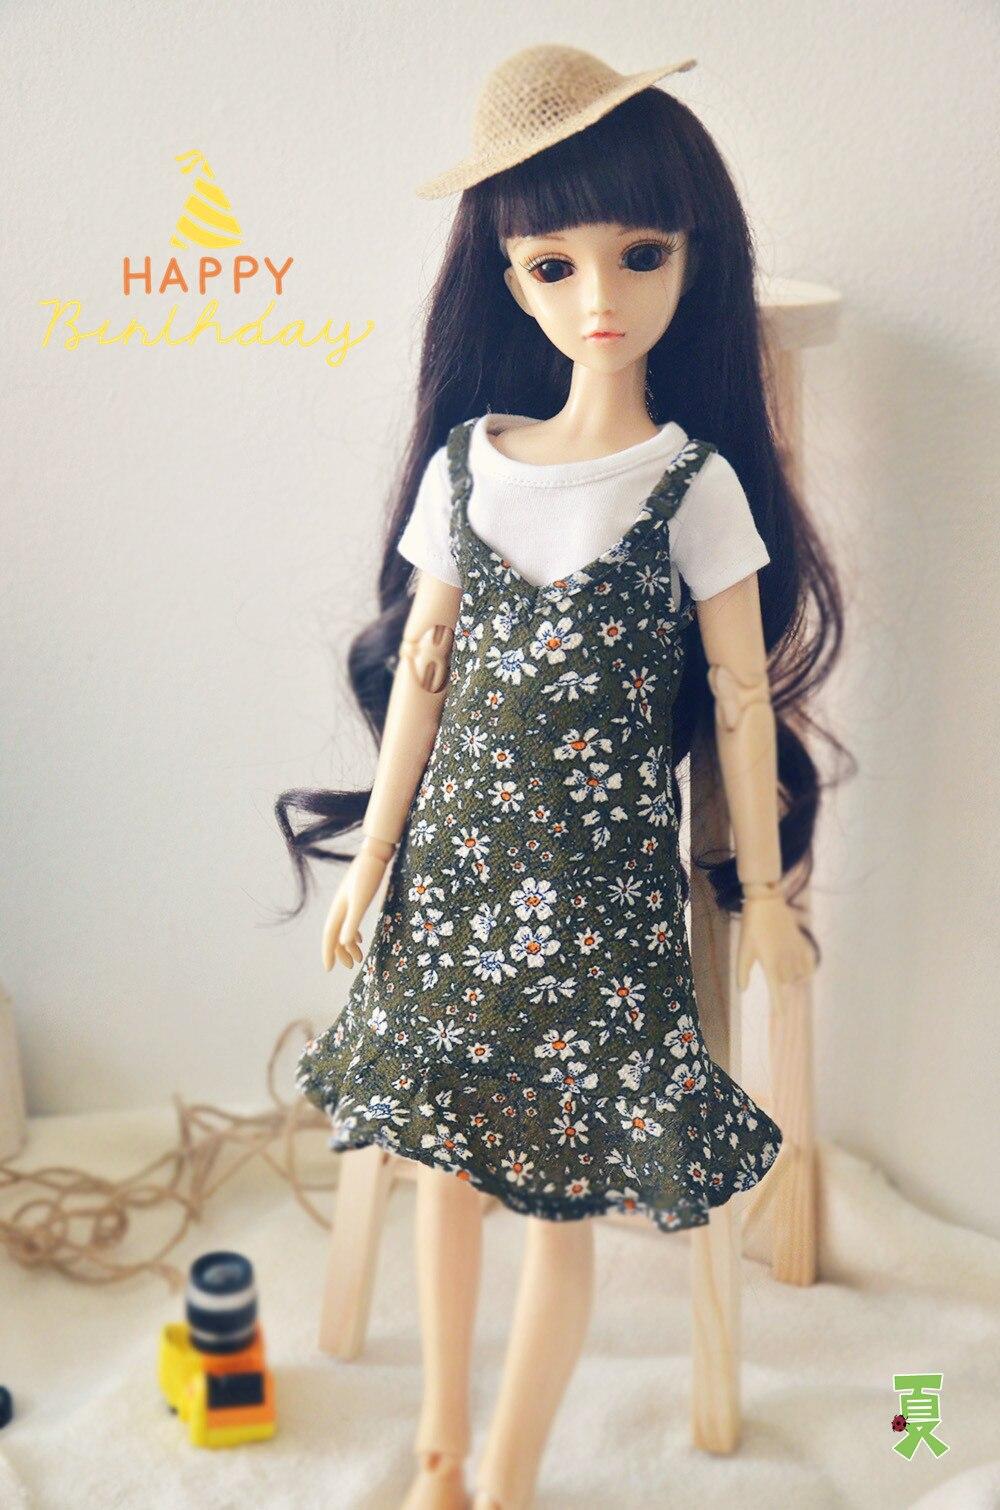 Summer Chiffon Floral Long Skirt+T shirt Set For BJD Doll 1/6 YOSD 1/4 MSD,1/3 SD16 DD Luts DOD AS DZ Doll Clothes CWB94